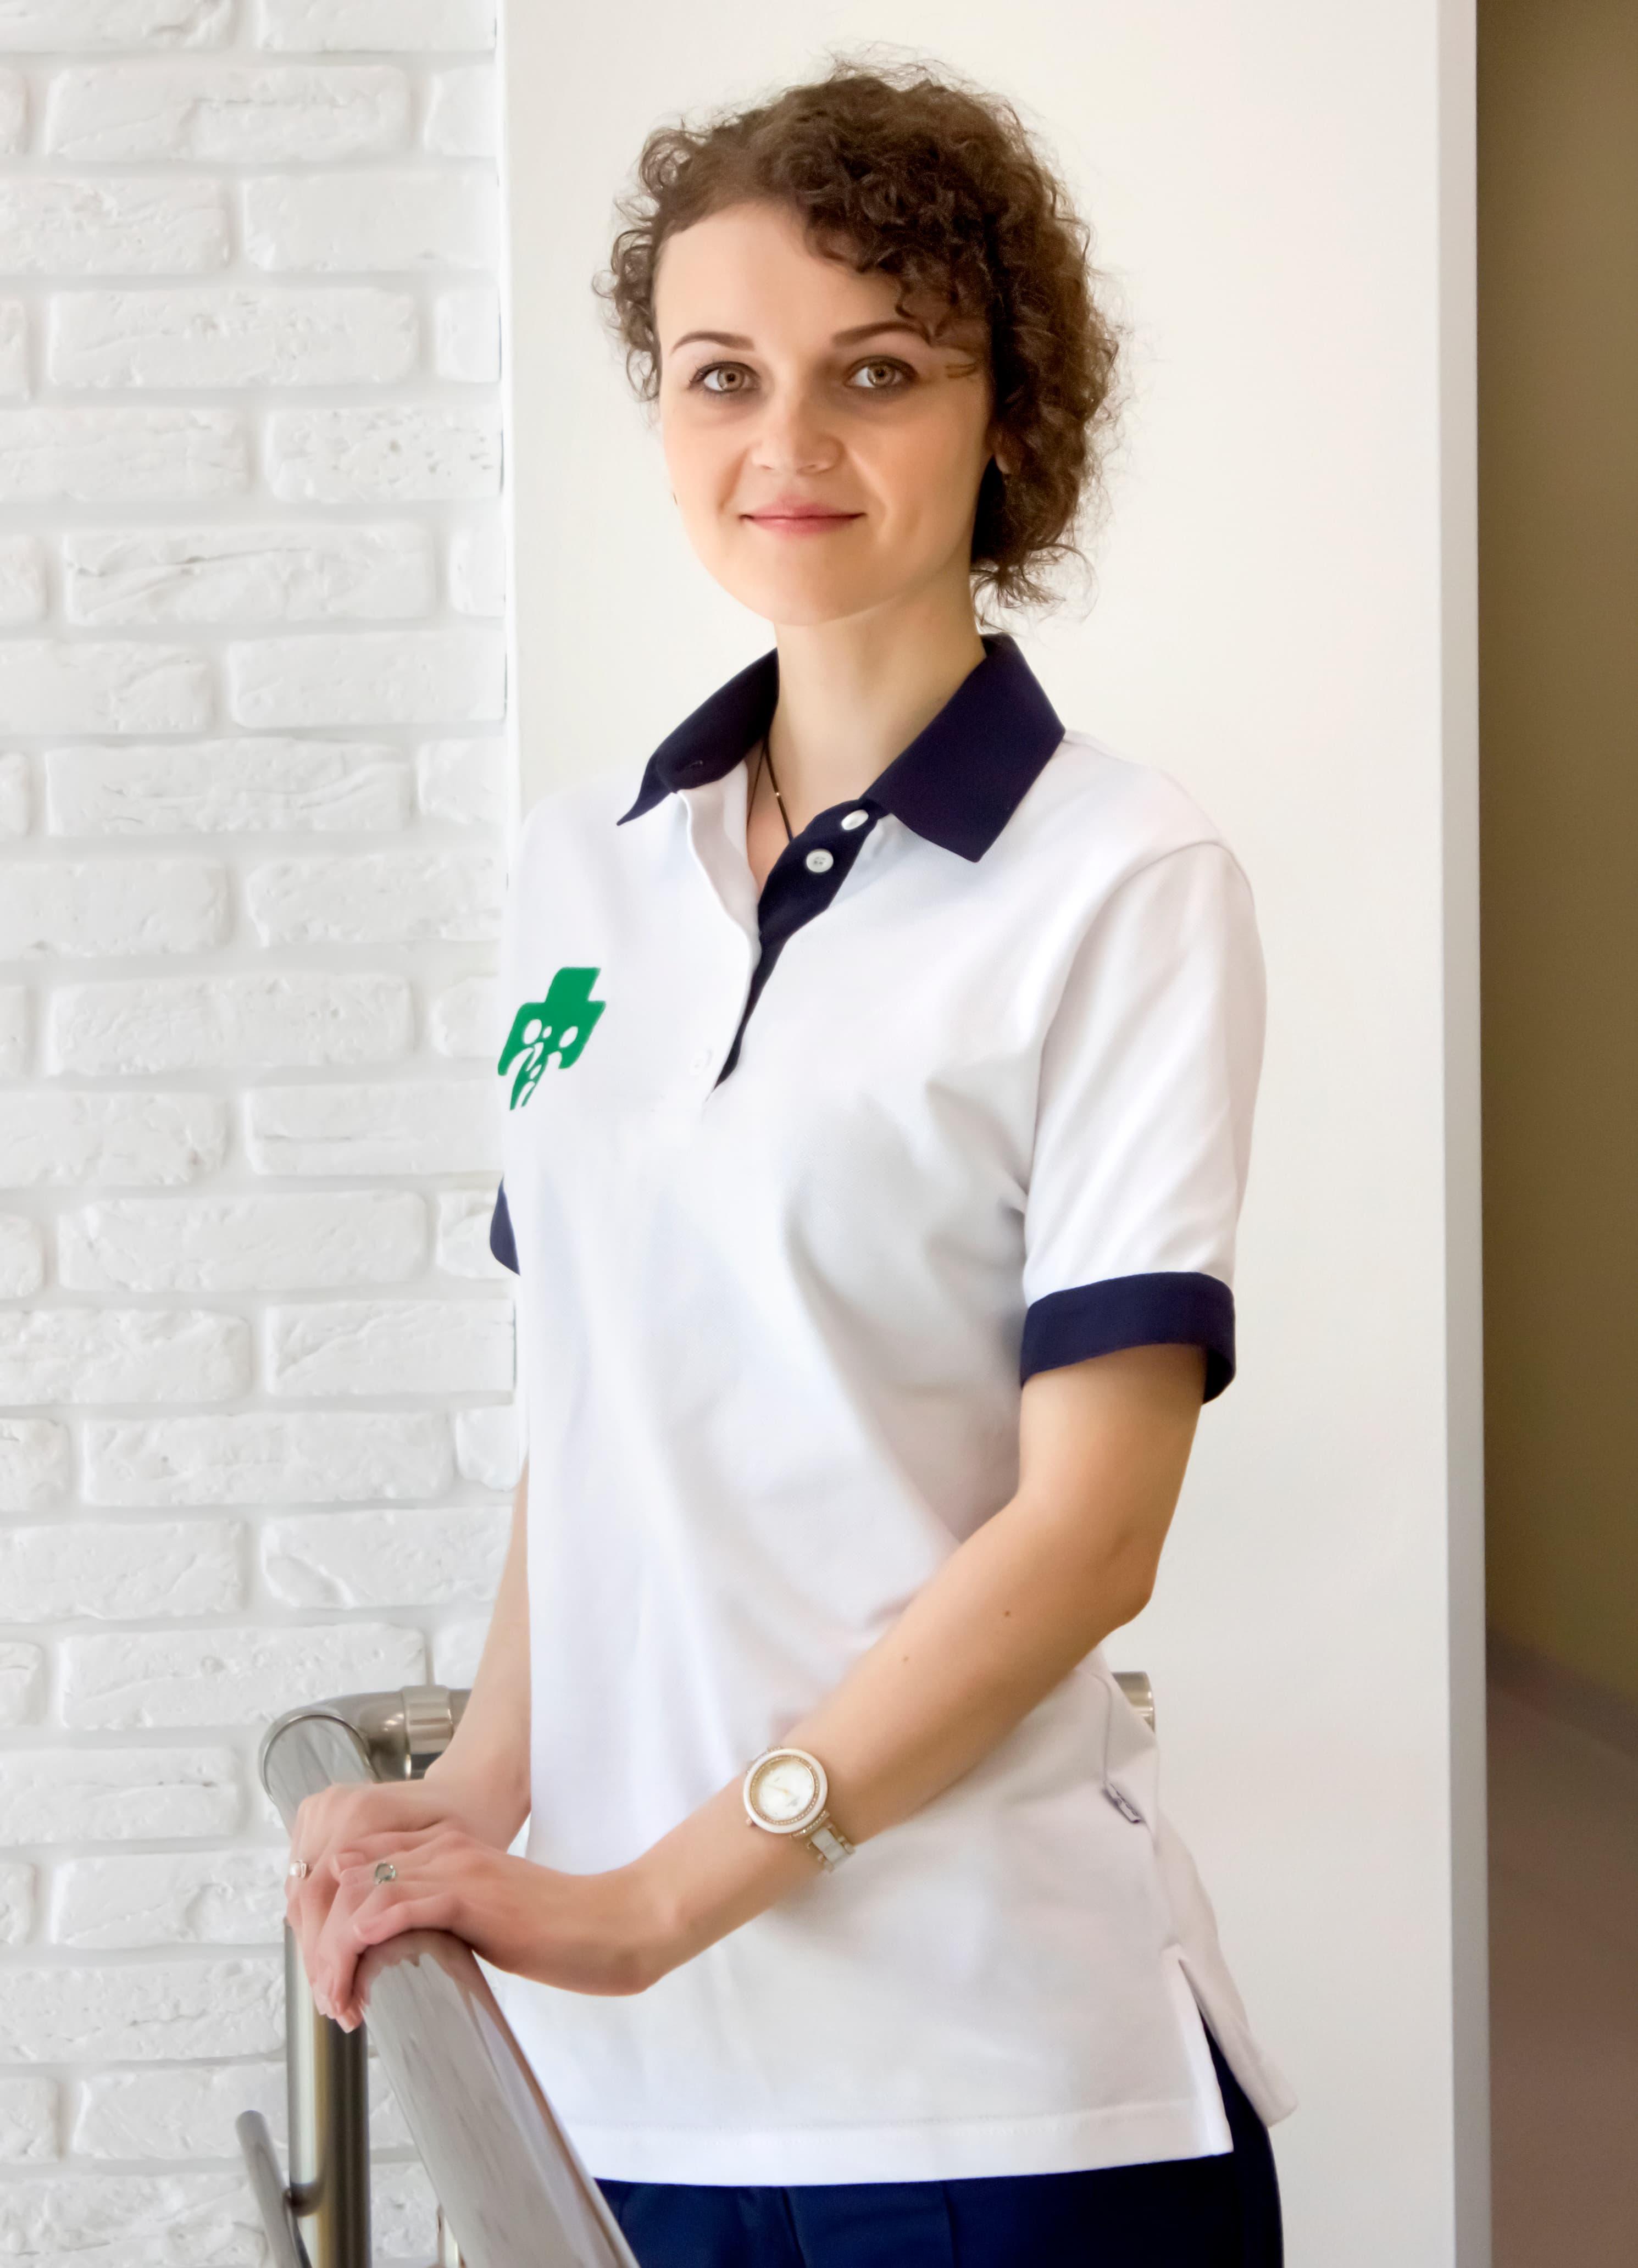 Мерешко Елена Викторовна - семейный врач